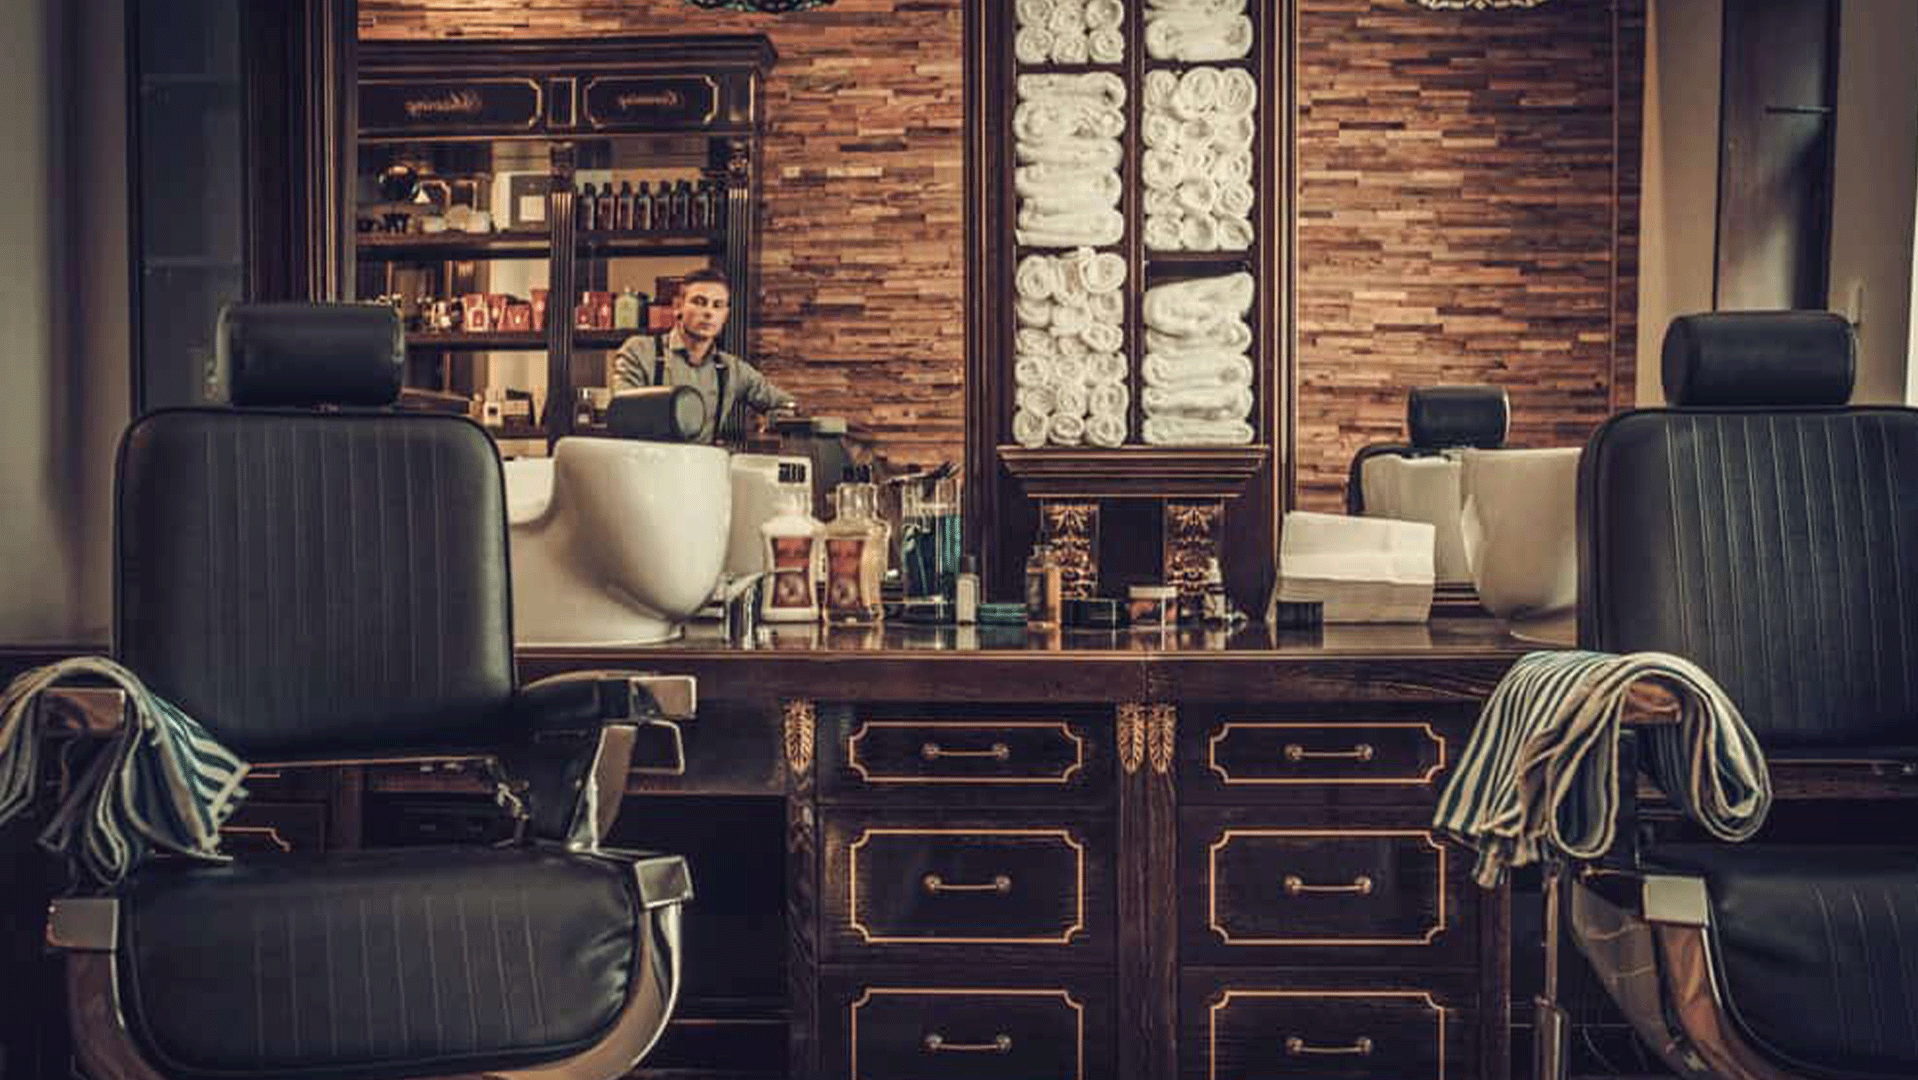 Untitled-1_0001_Barbershop-interior-design-dec8-00011